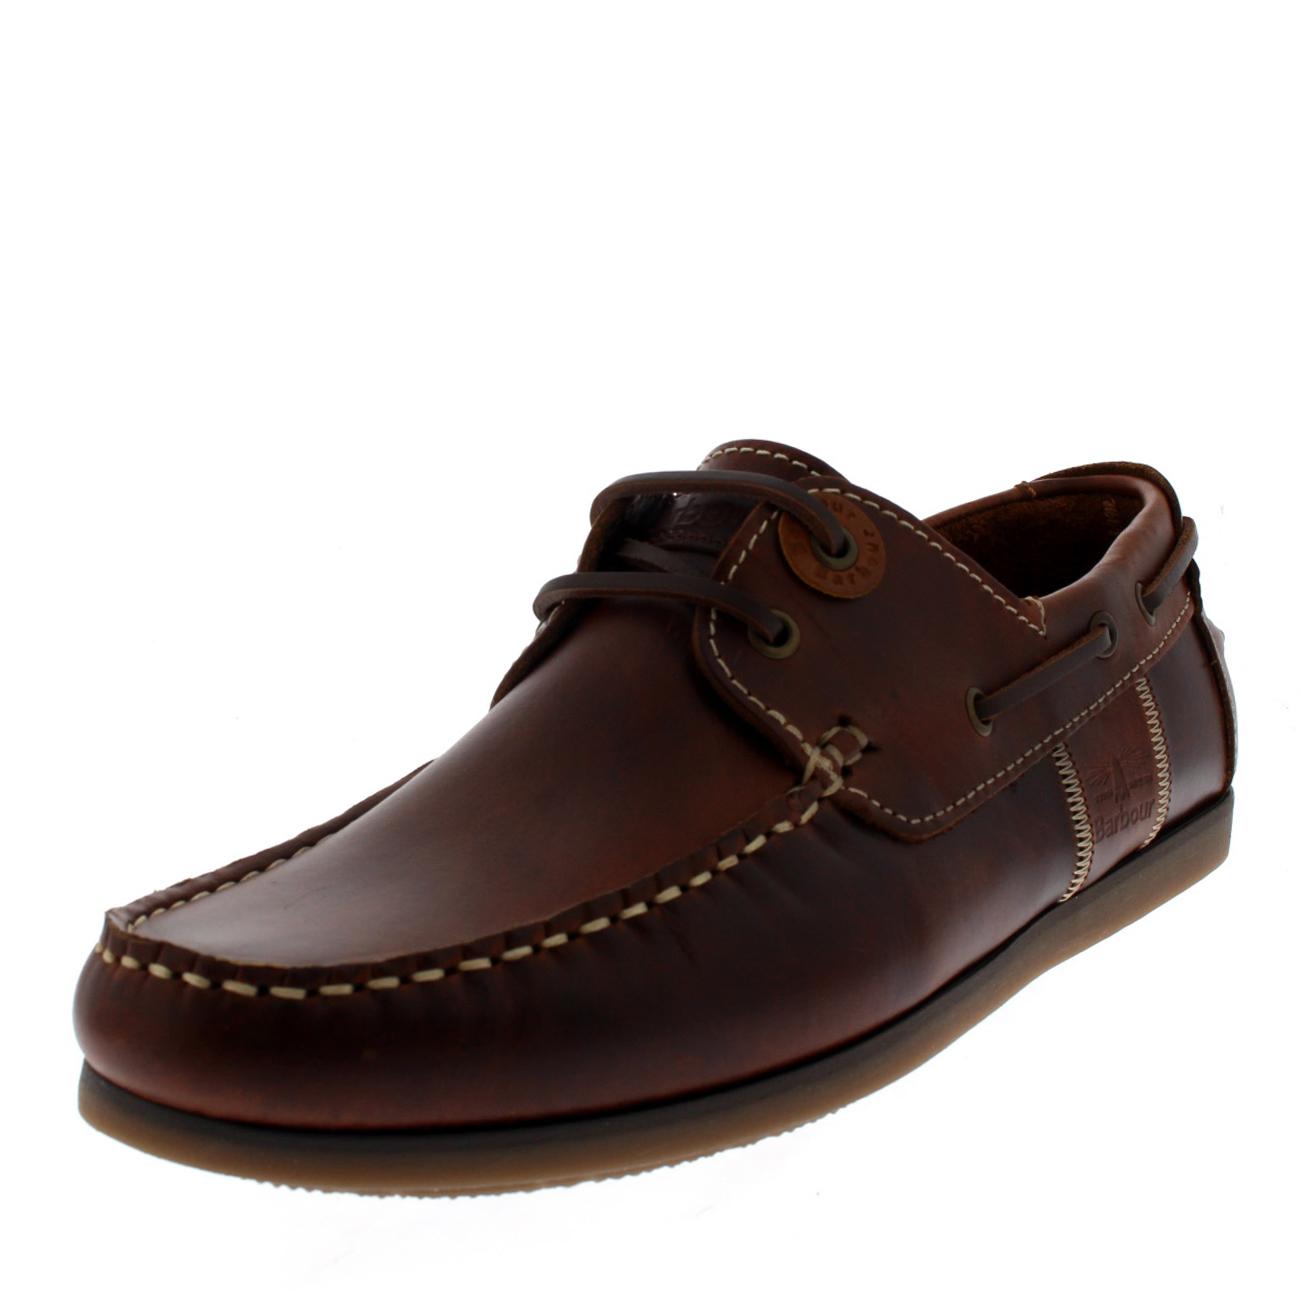 Barbour Bedlington Leather